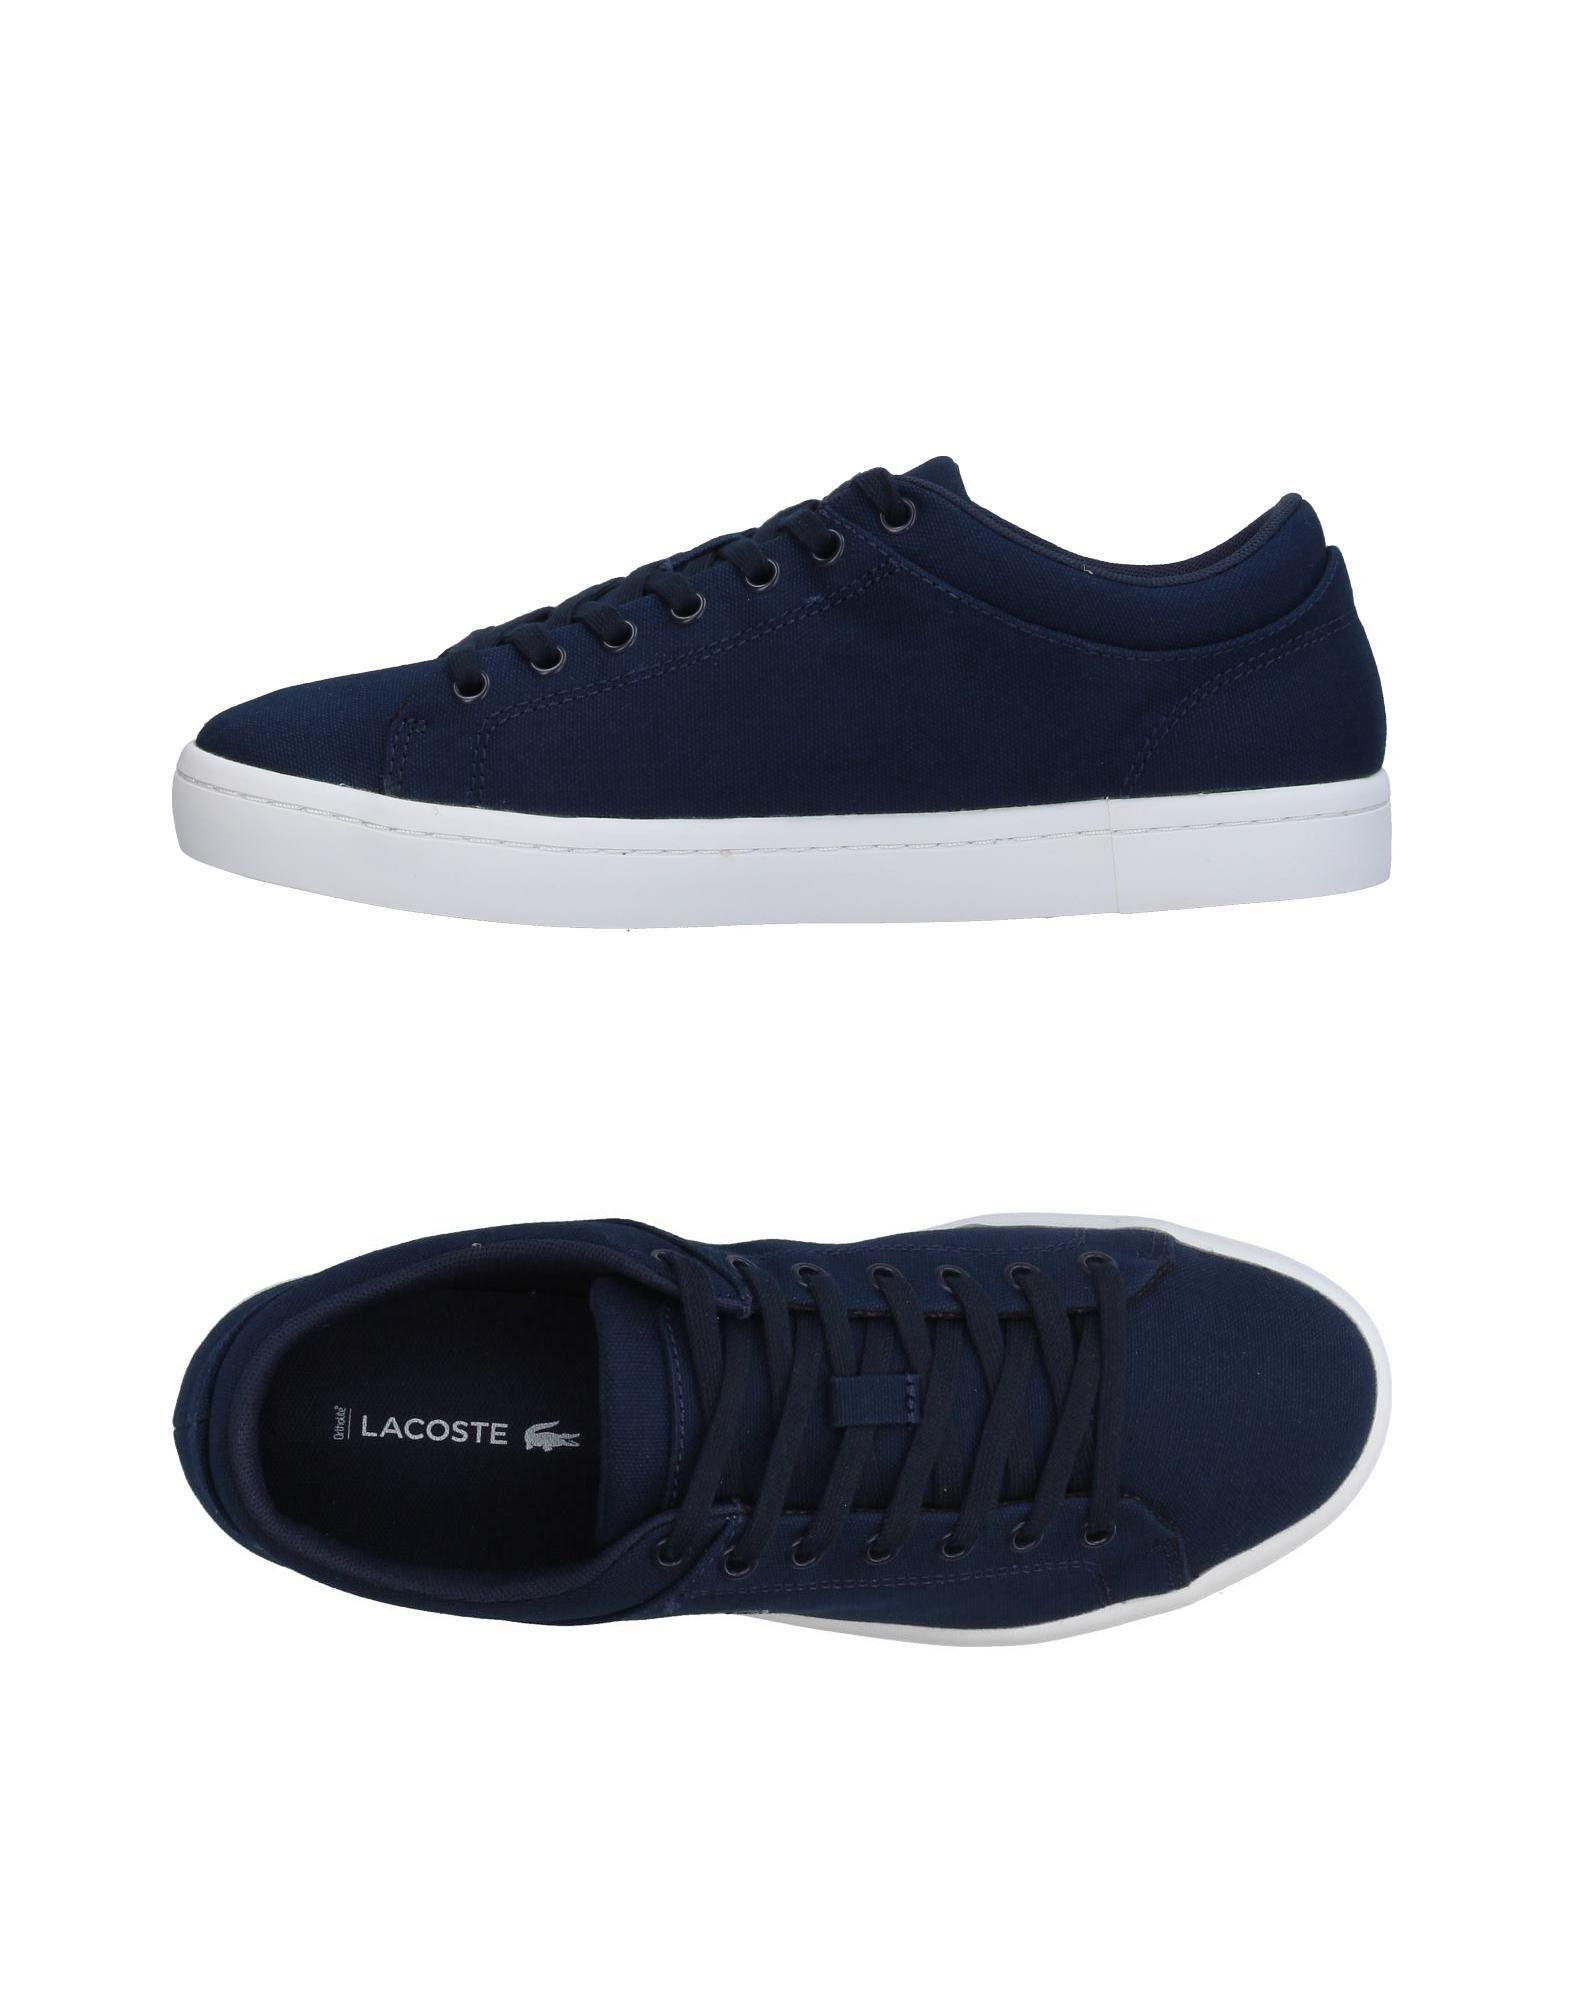 Moda Sneakers Lacoste Uomo - 11394952KP